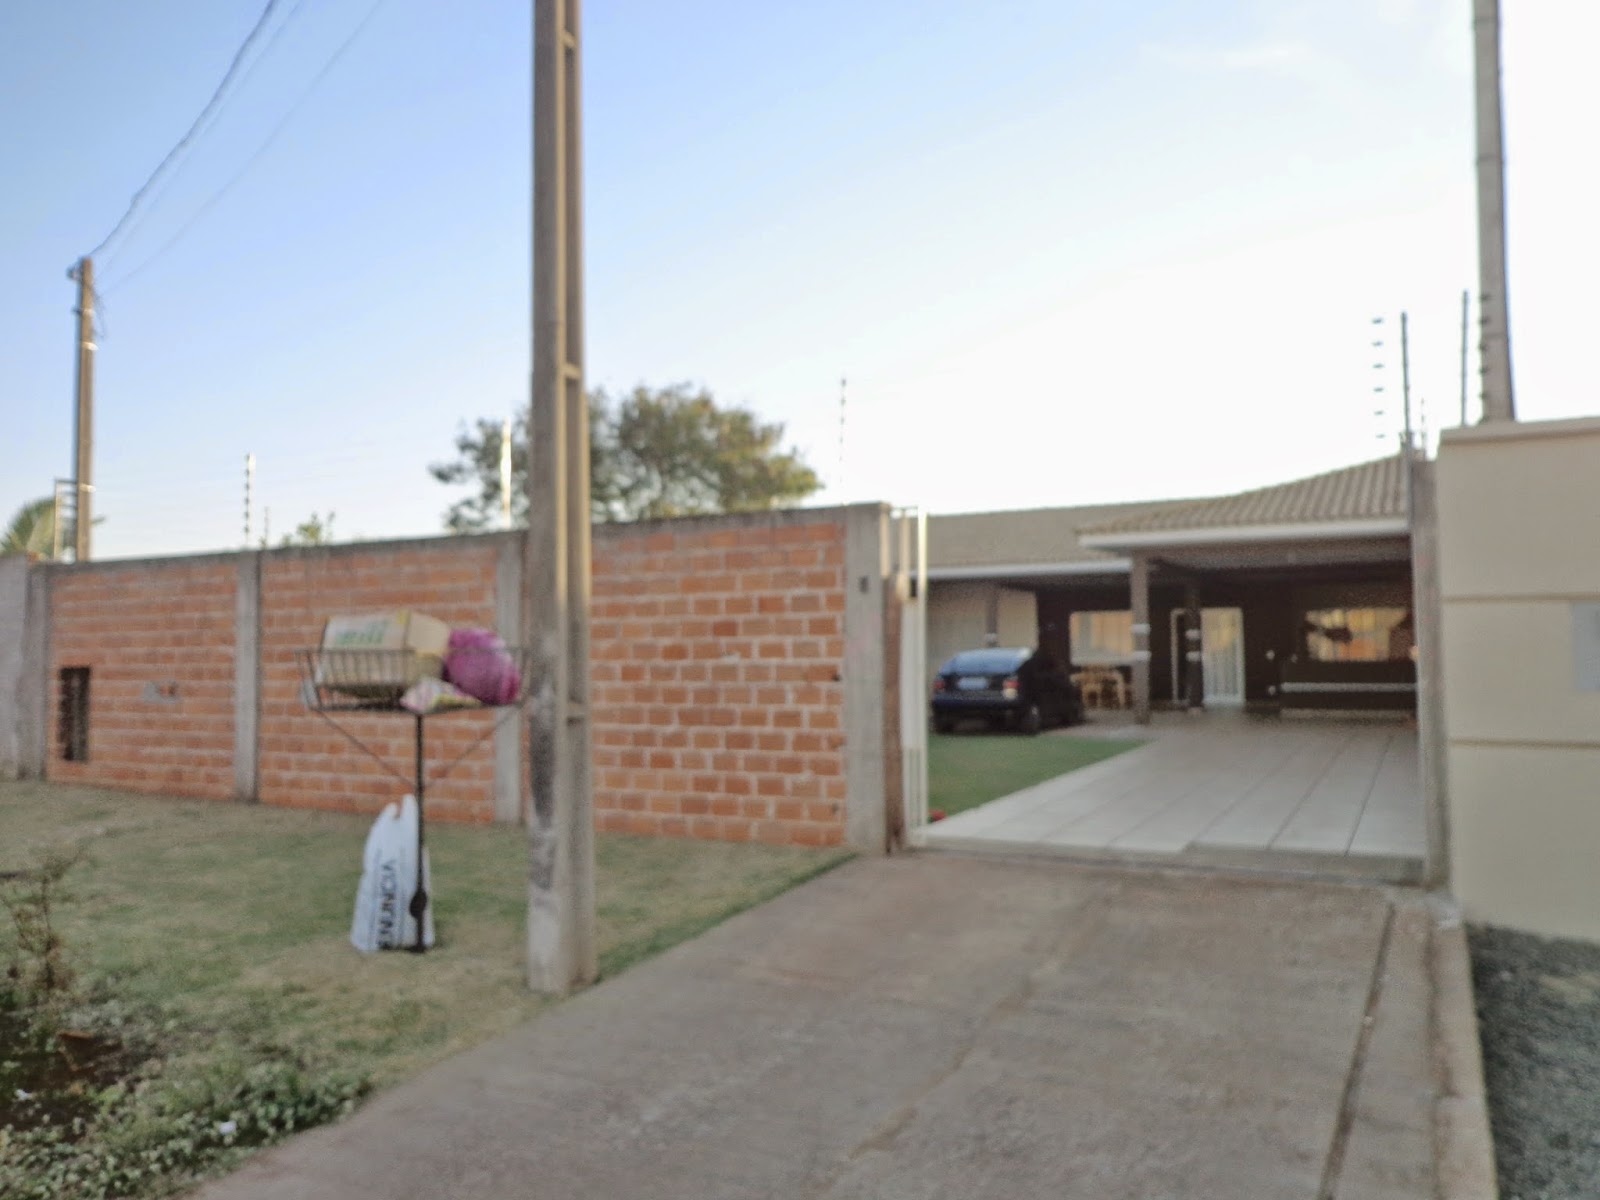 jardim ipe foz do iguacu : jardim ipe foz do iguacu: quartos (01 suíte) Jardim Ipê III – Foz do Iguaçu, R$ 250.000,00